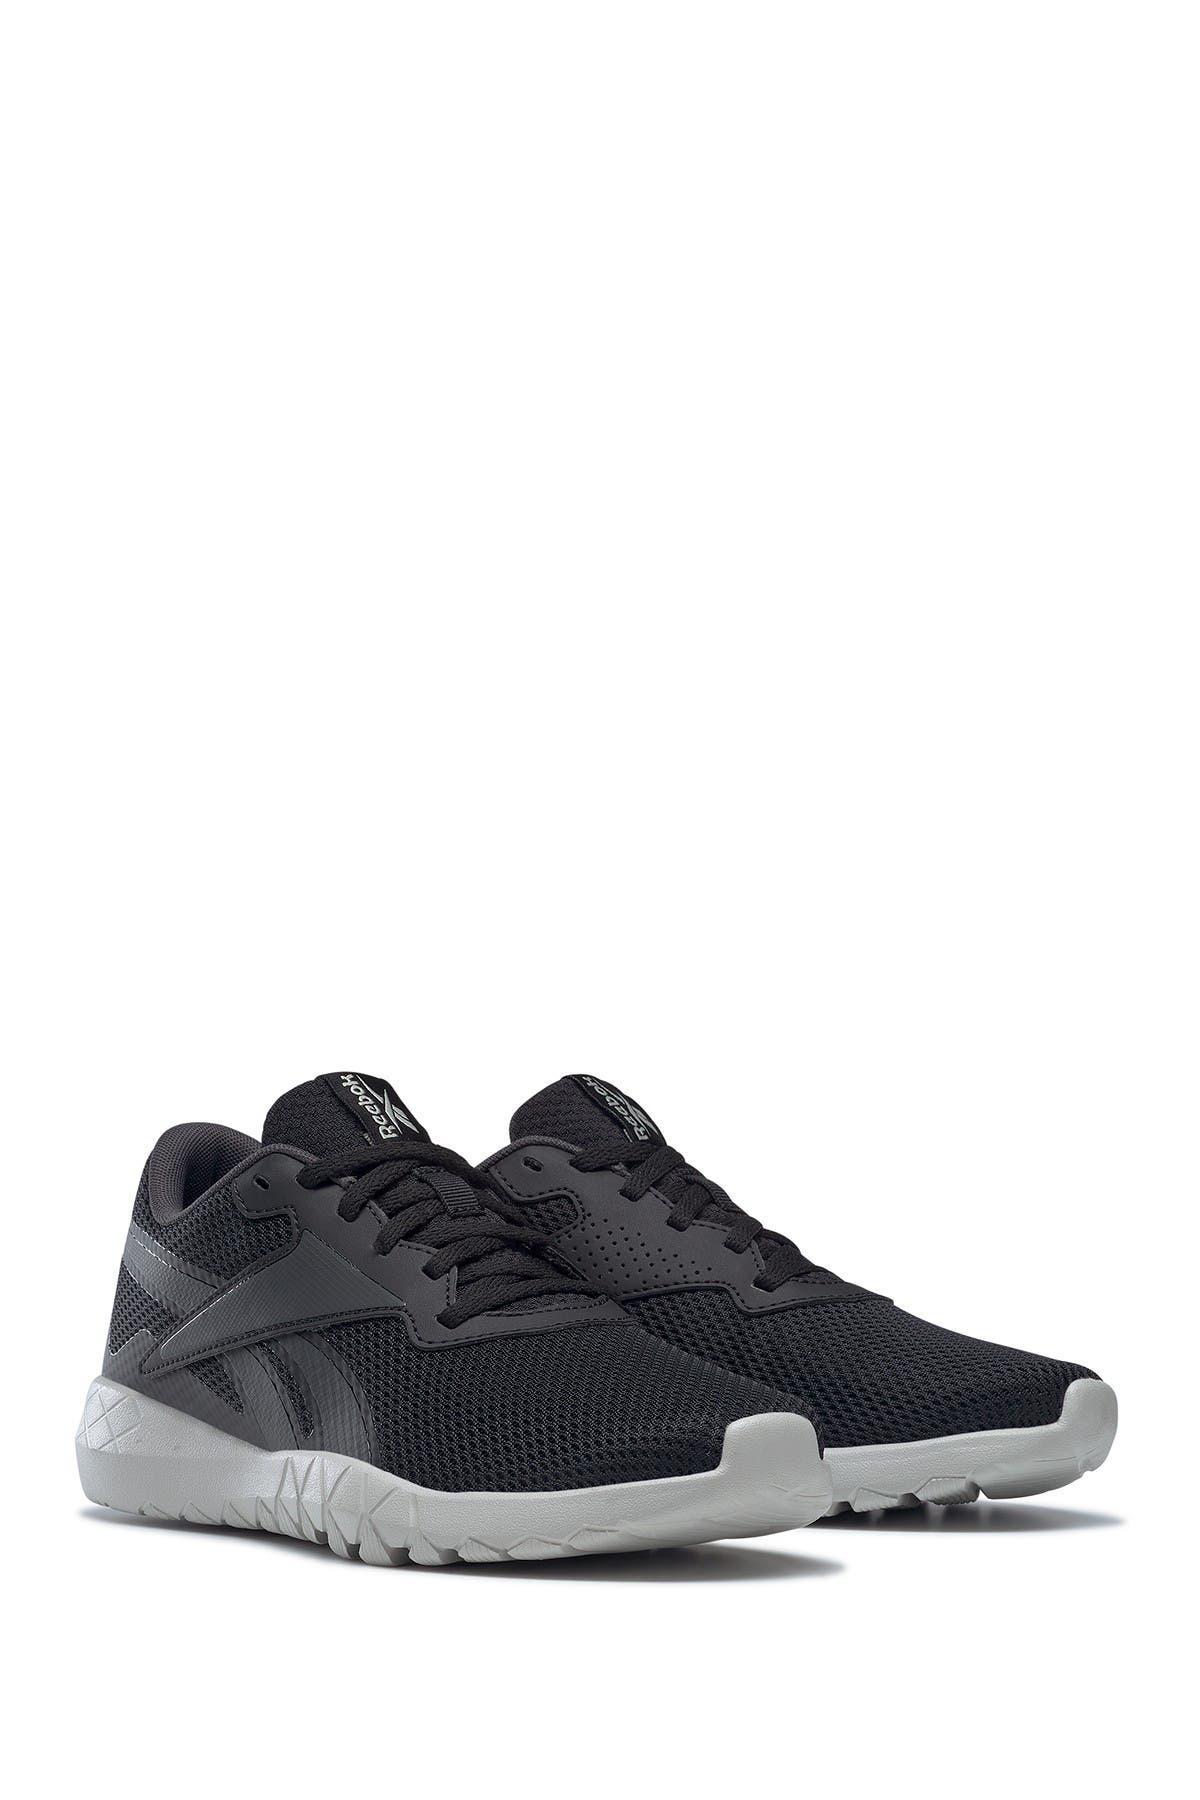 Image of Reebok Flexagon Energy TR 3.0 Sneaker